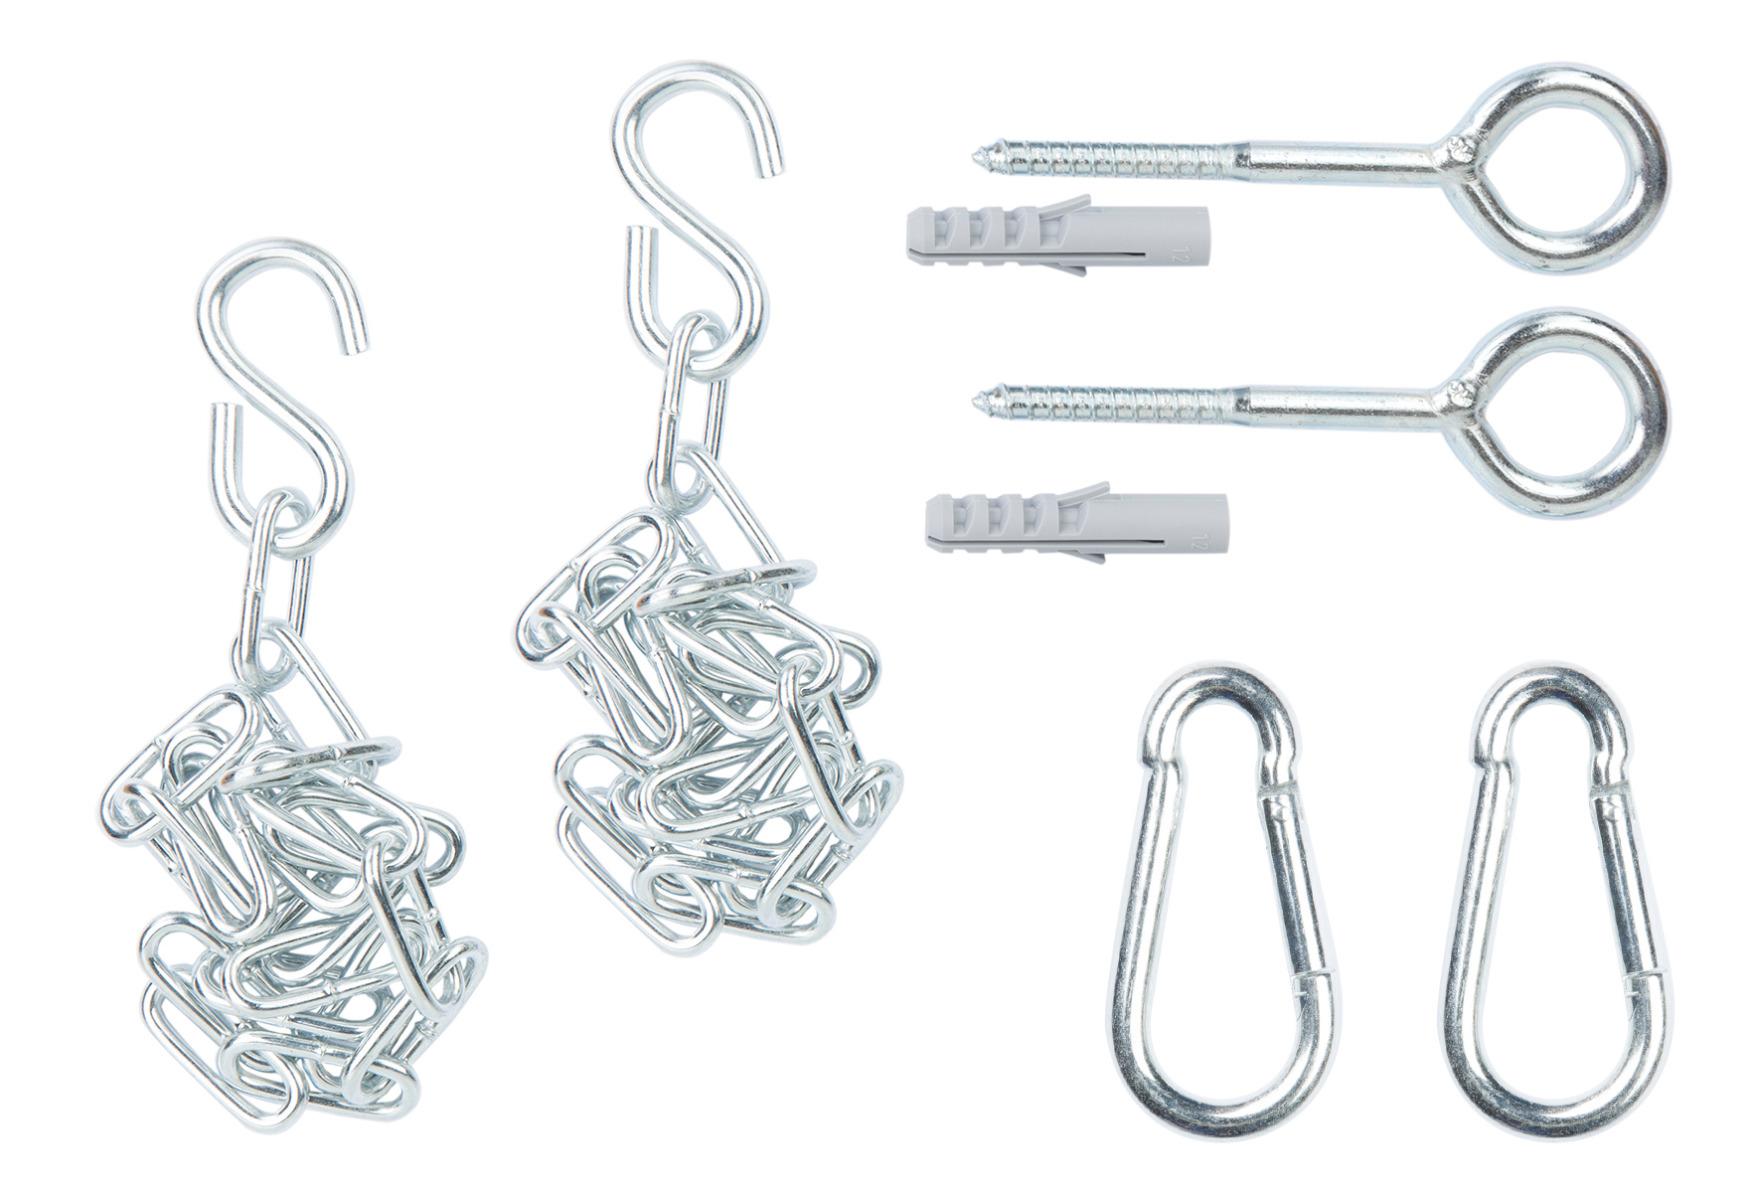 Hangmatbevestiging 'Complete' Metal - Metaal - Tropilex �